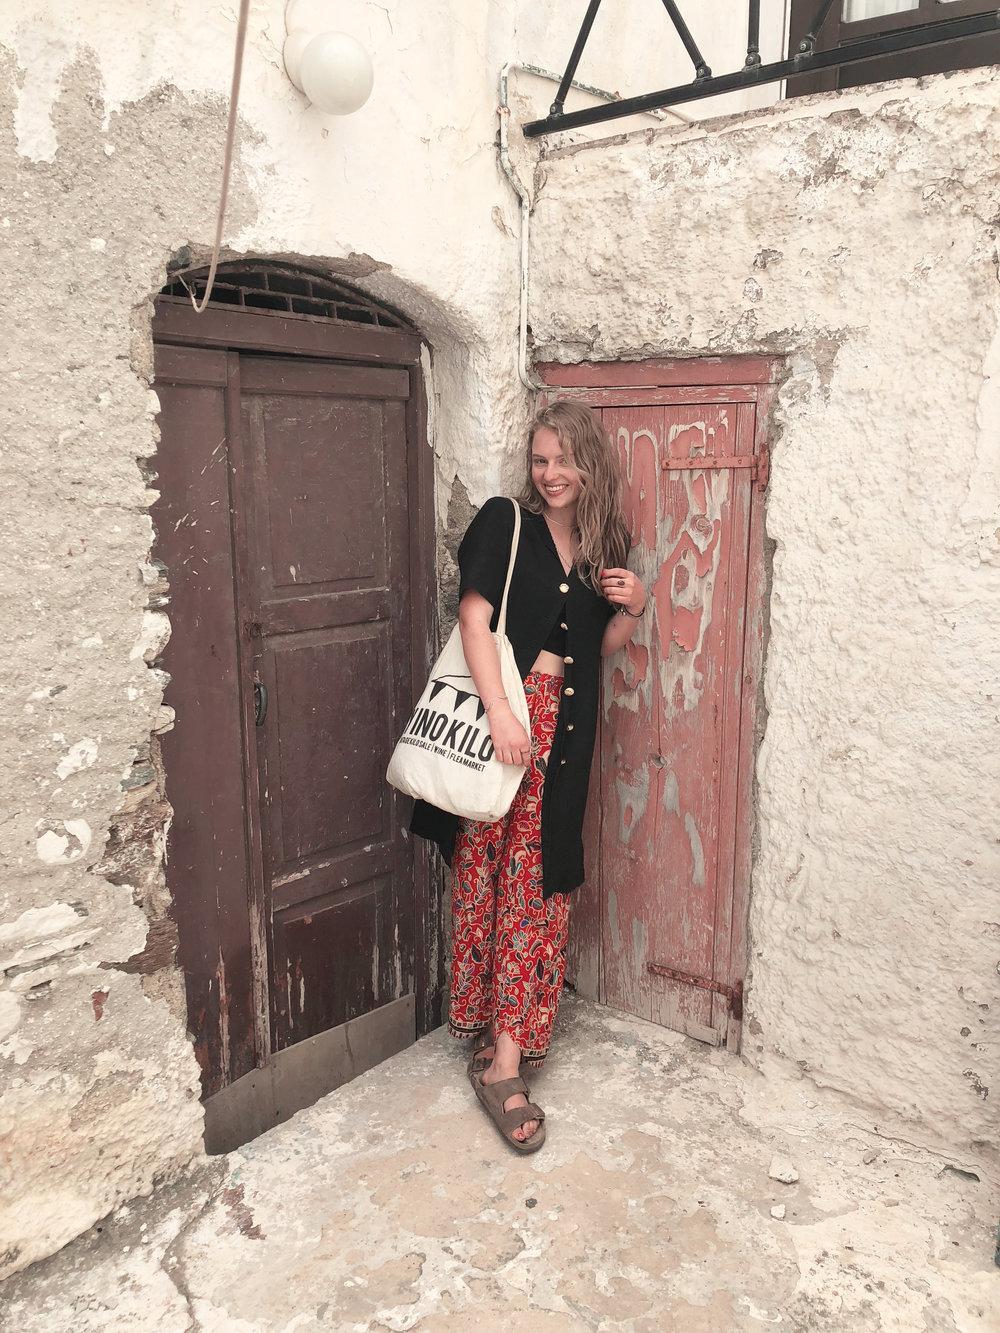 Onna Weber, VinoKilo's social media manager